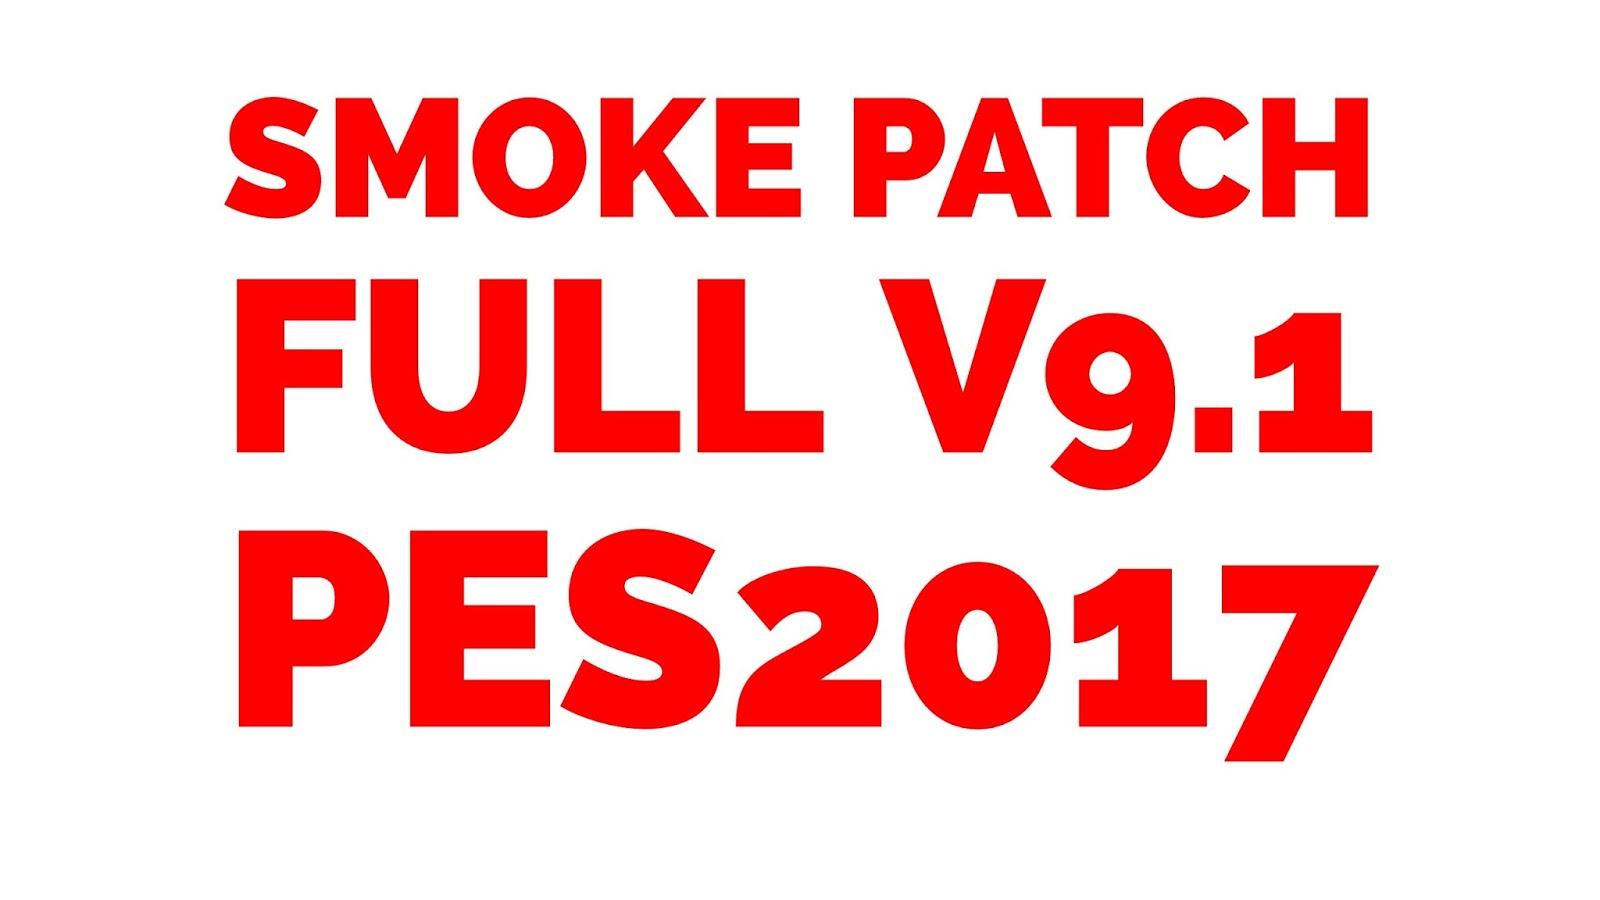 pes 2017 pc smoke patch 9.1